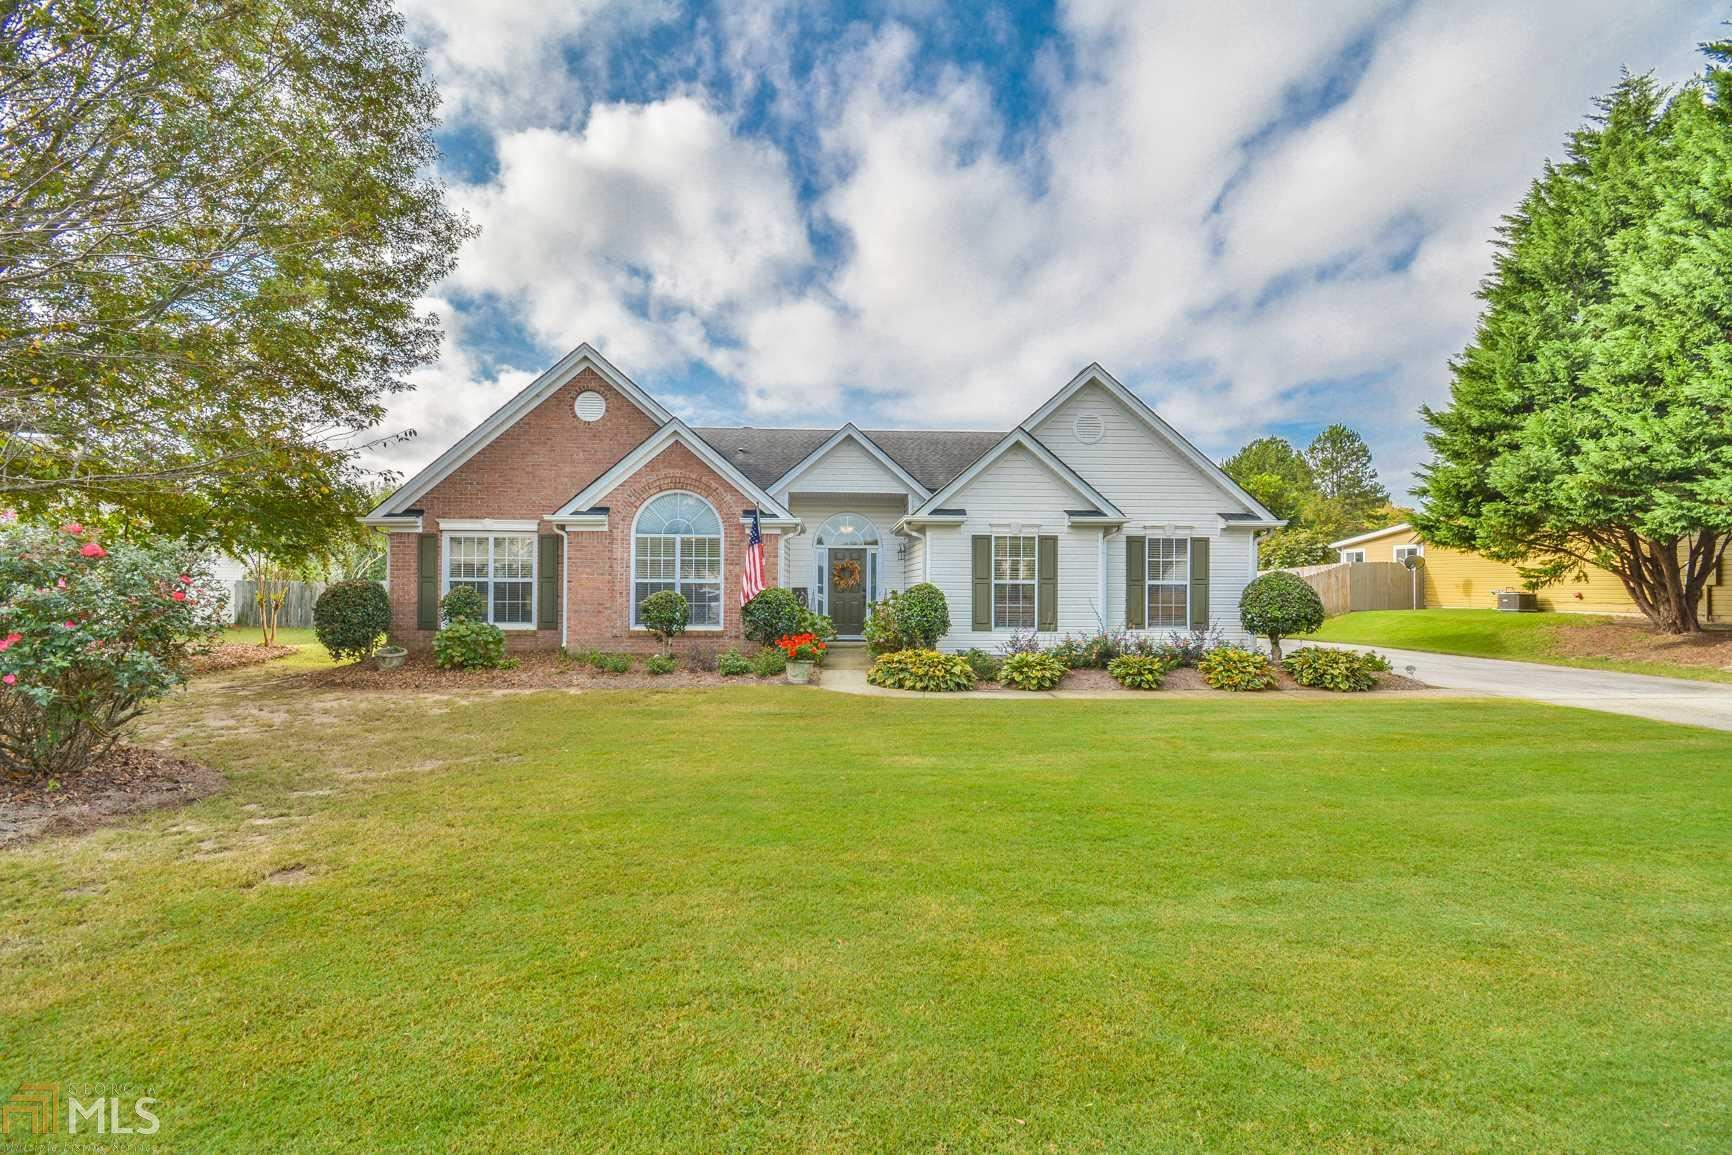 3219 Woodtree Ln, Buford, GA 30519 - MLS#: 8879201